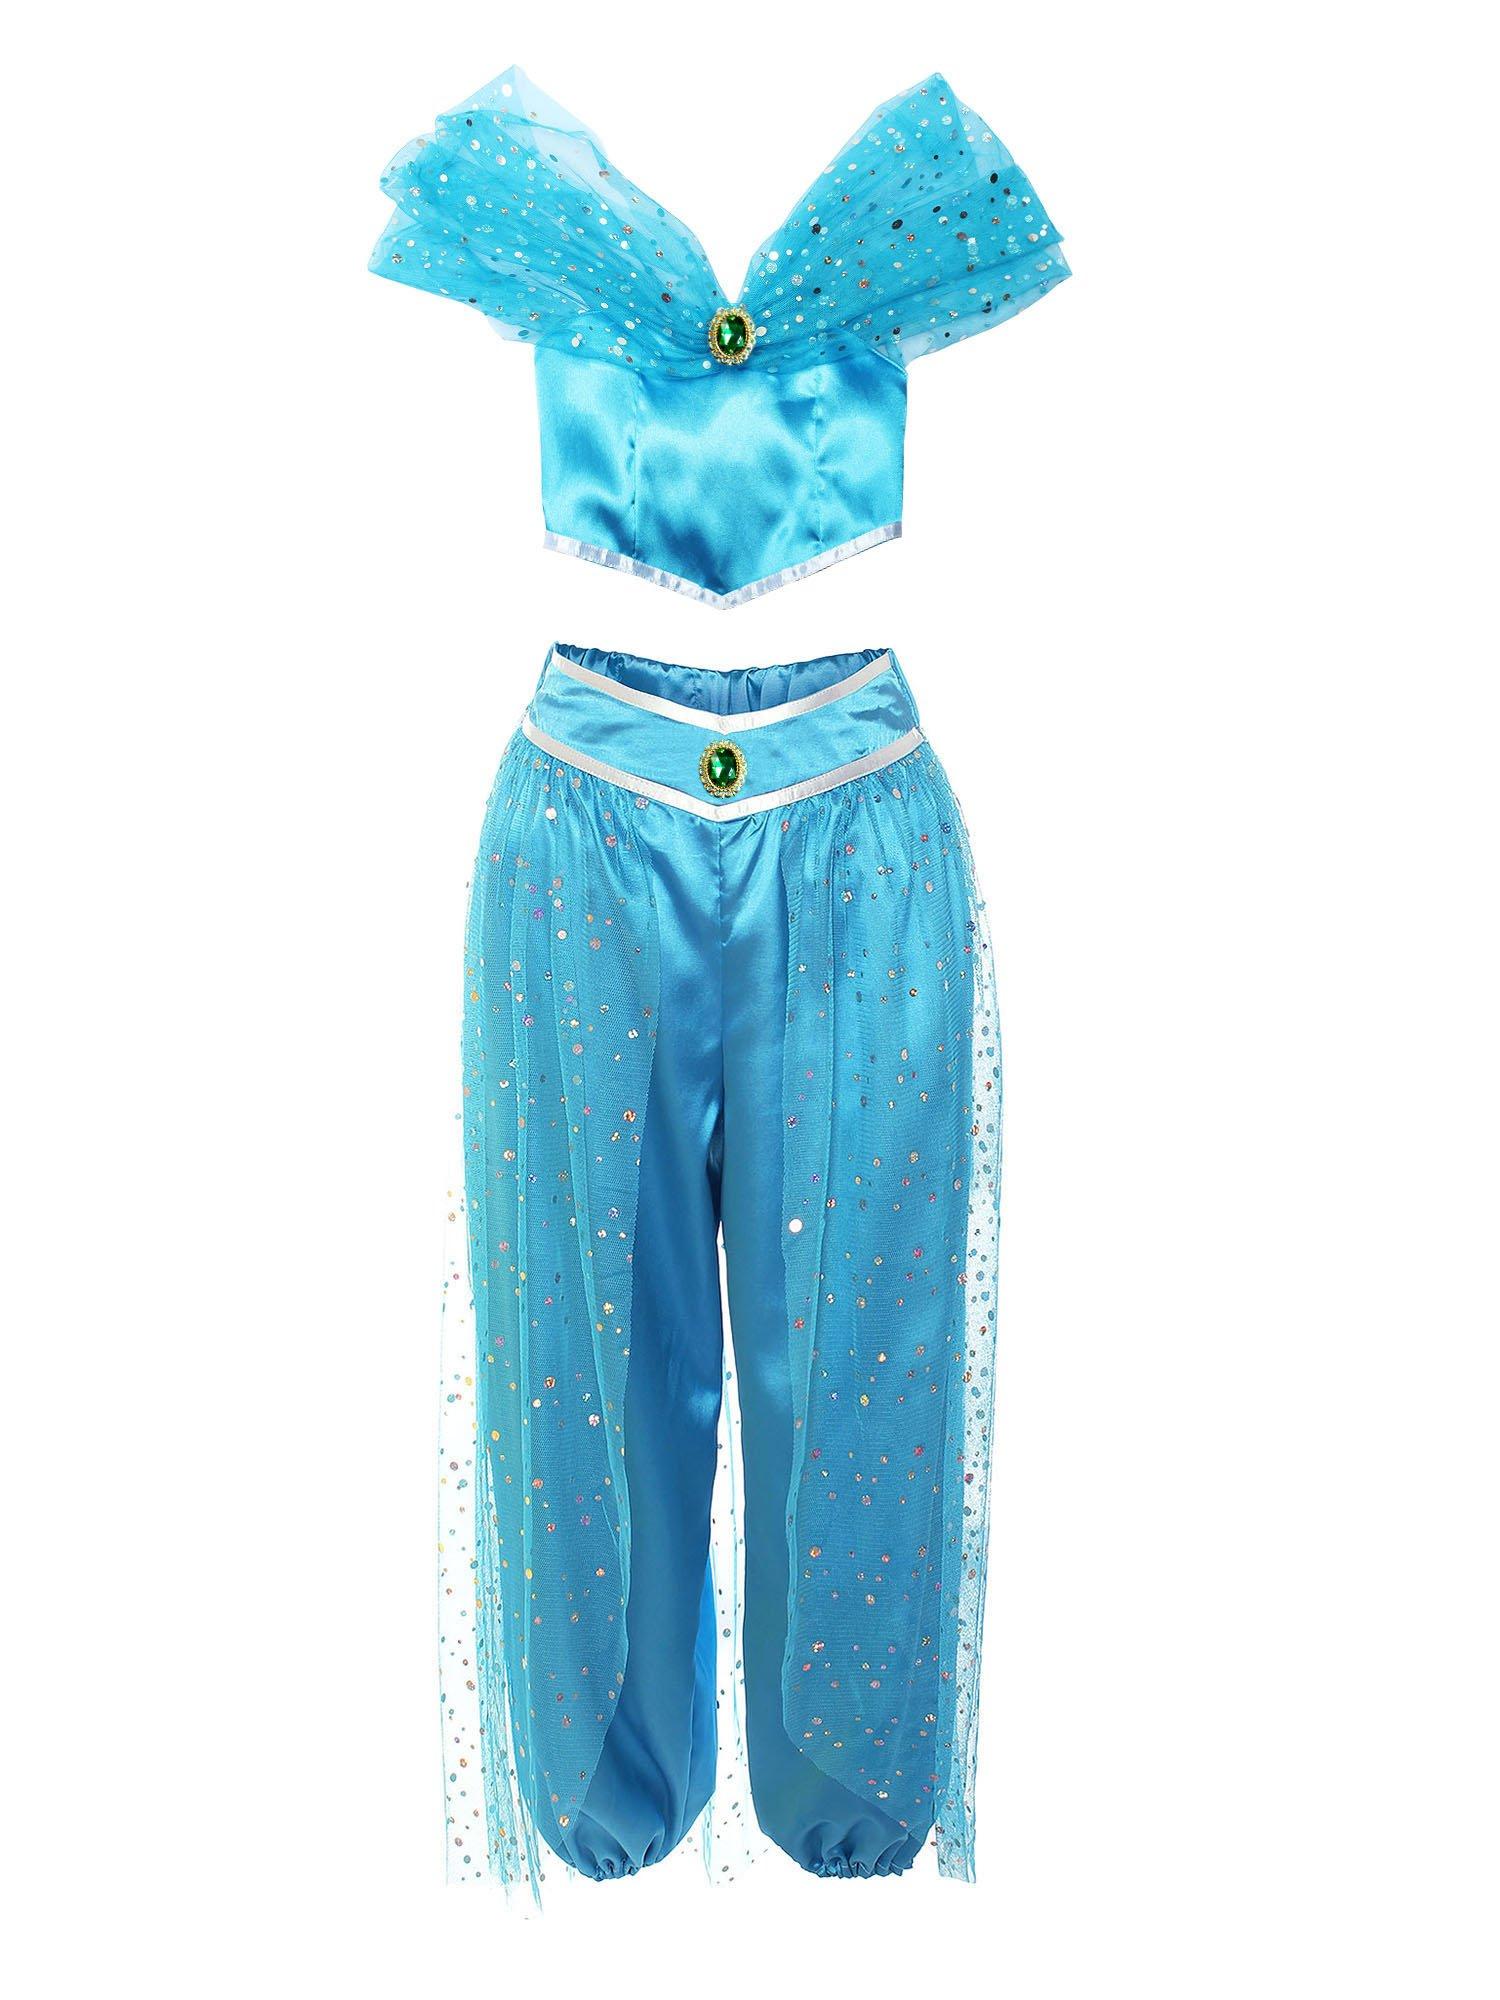 ReliBeauty Girls Sequin Pant Set Princess Costume, Blue, 7-8